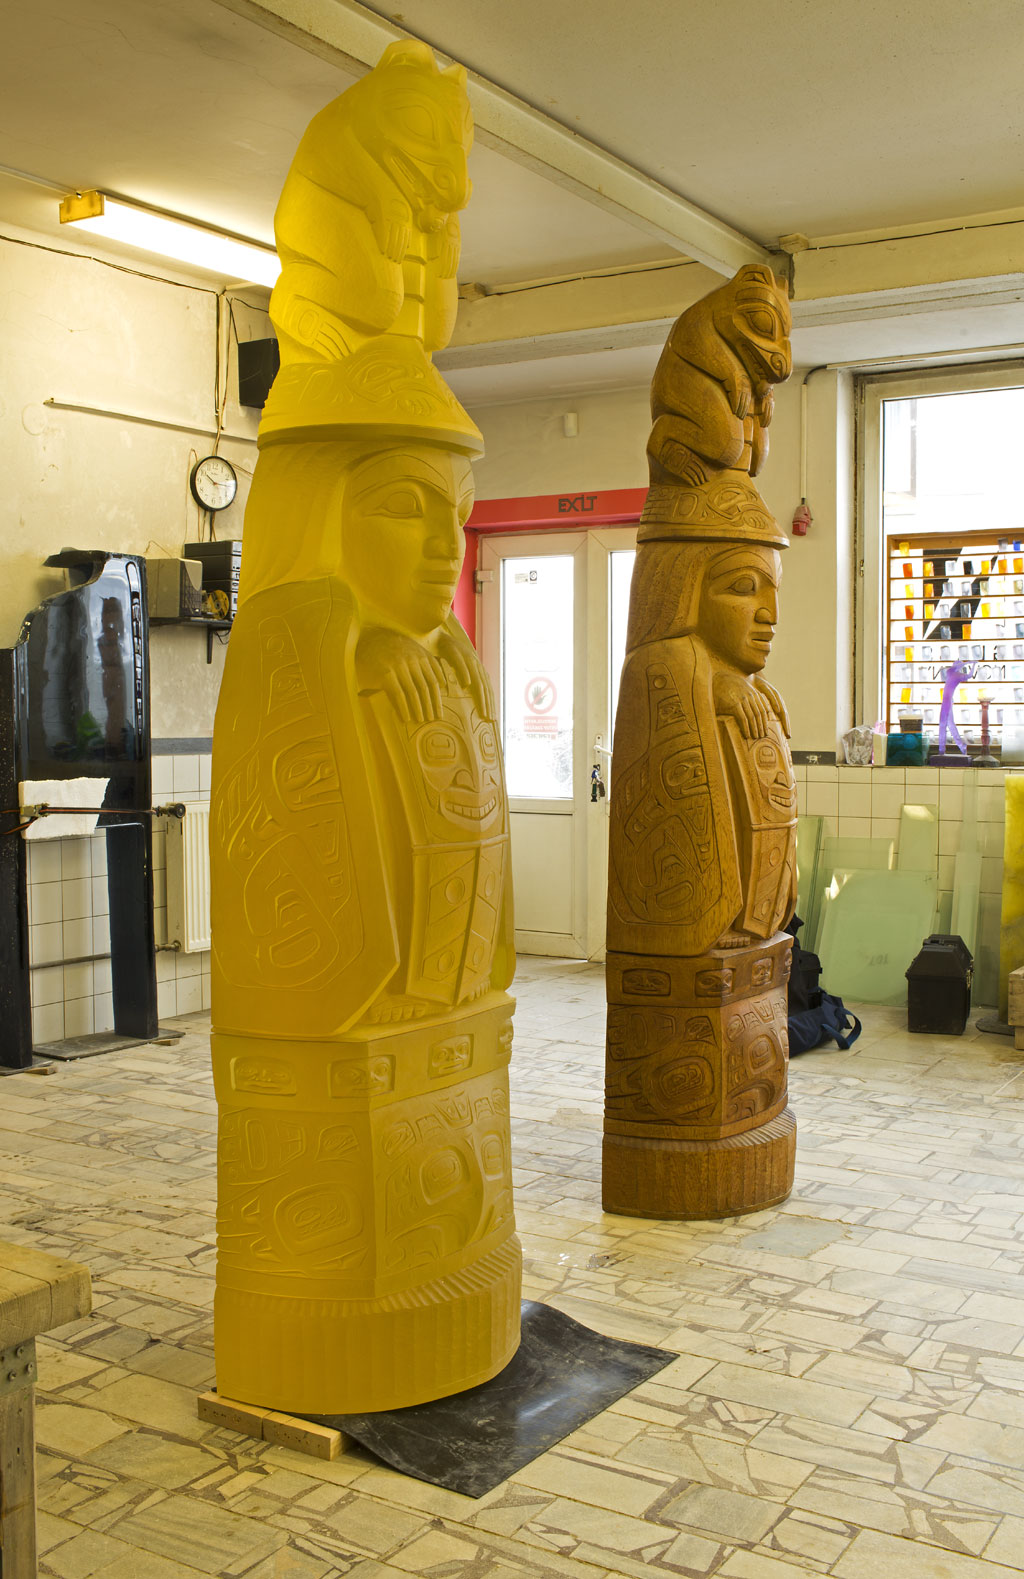 Family Story Totem by Preston Singletary and carved cedar log totem by David Svenson, Nature, Craft in America